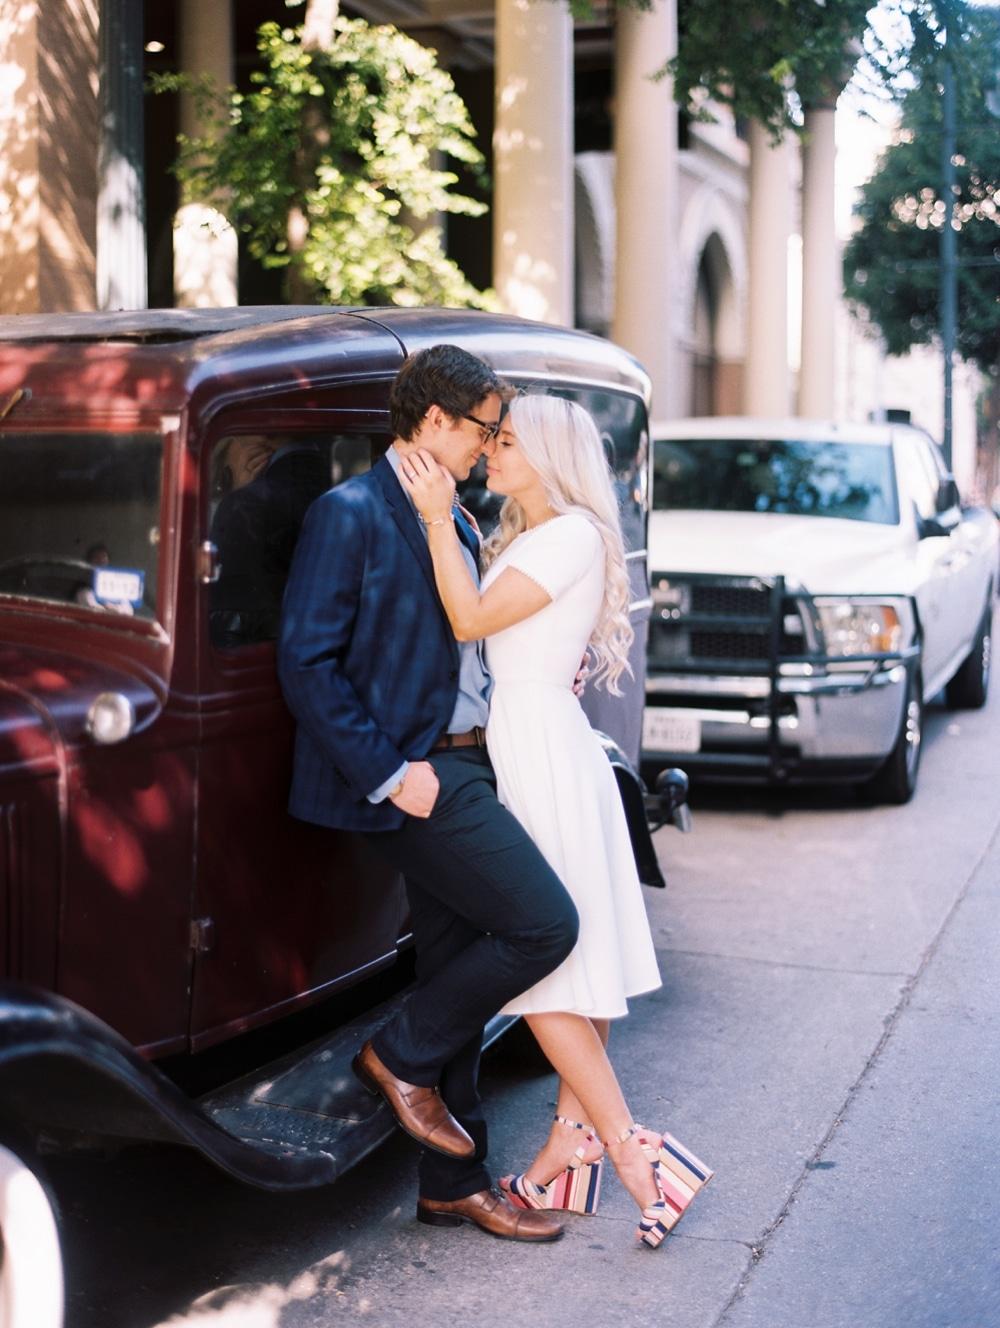 kristin-la-voie-photography-austin-wedding-photographer-the-driskill-35